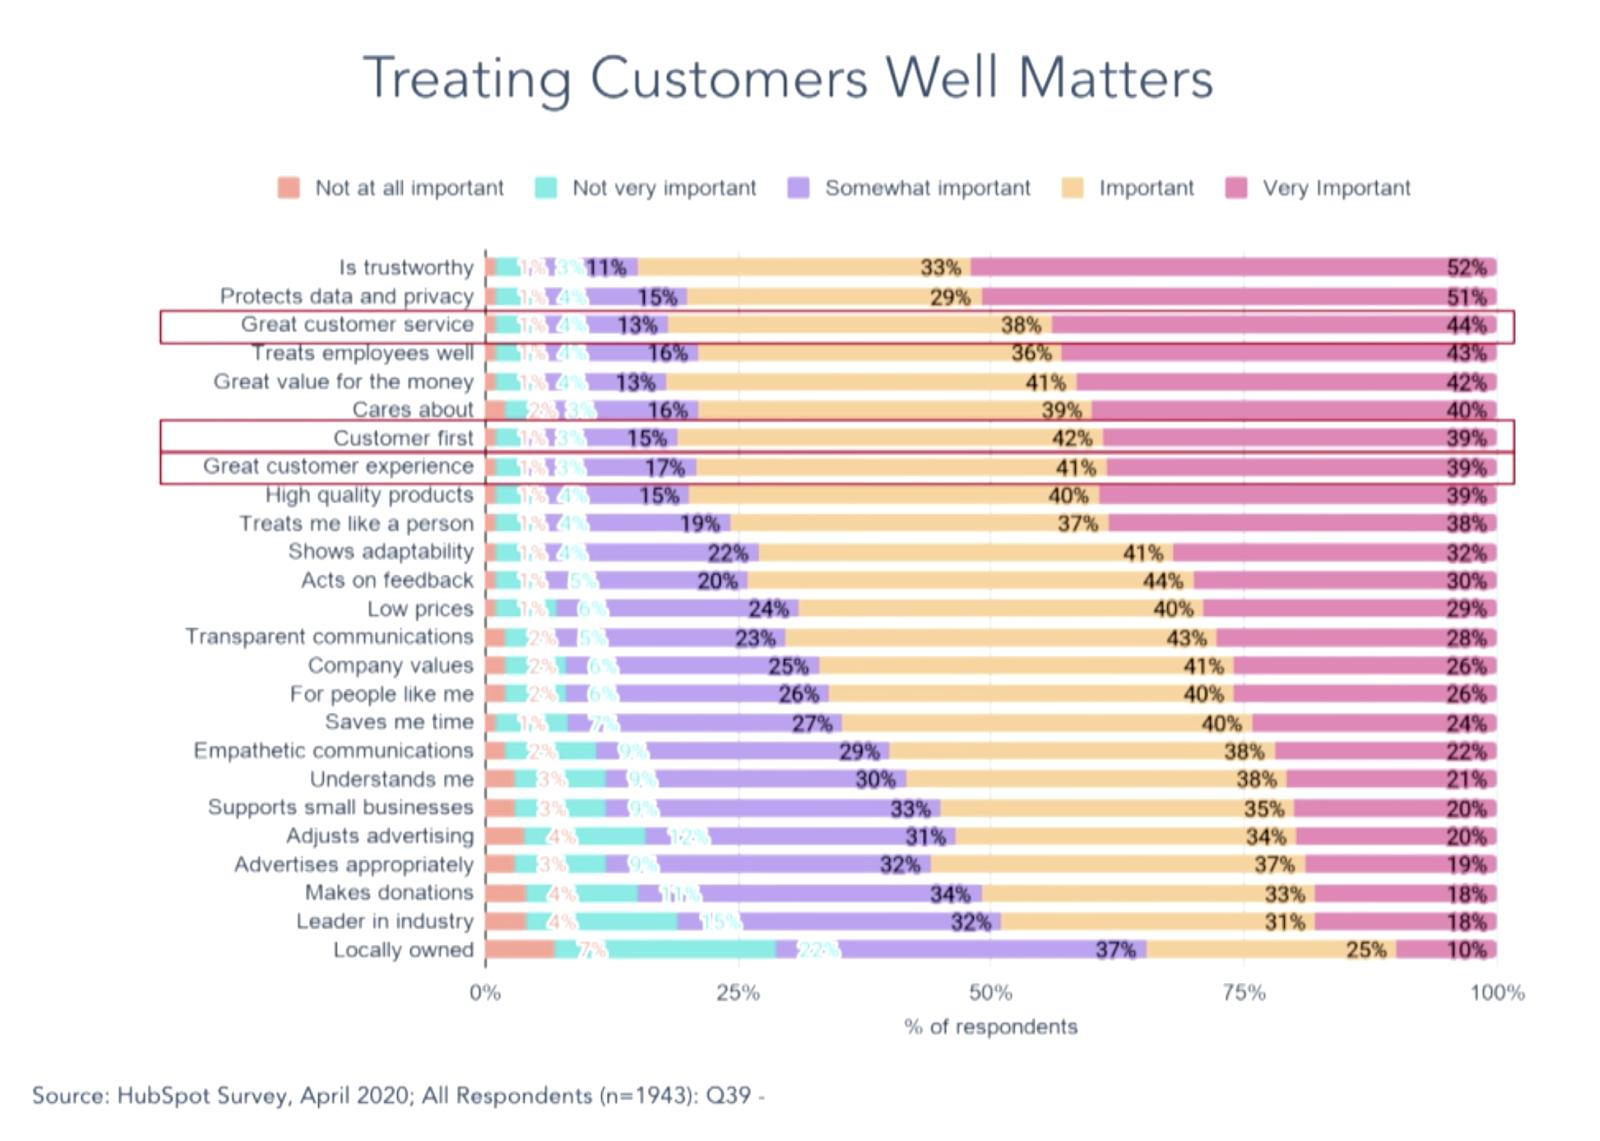 HubSpot Graph - Treating Customers Well